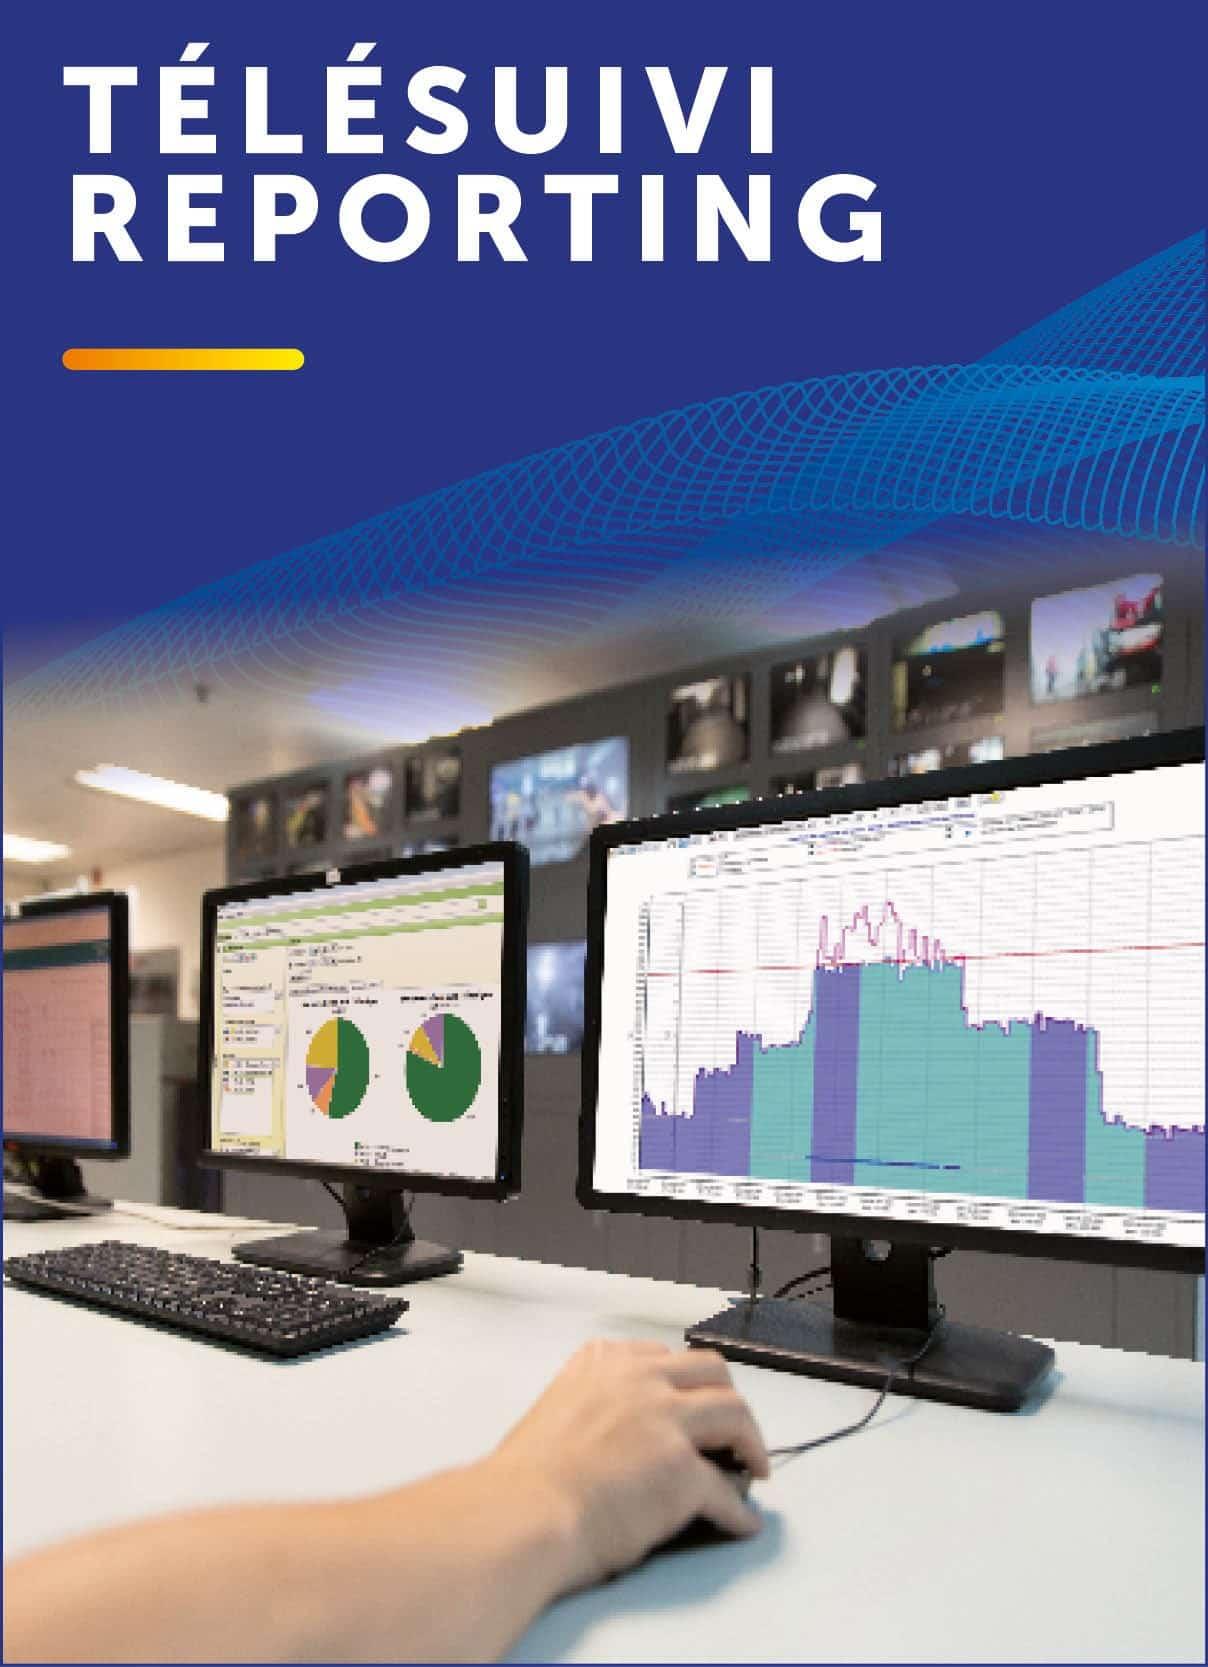 TÉLÉSUIVI / REPORTING